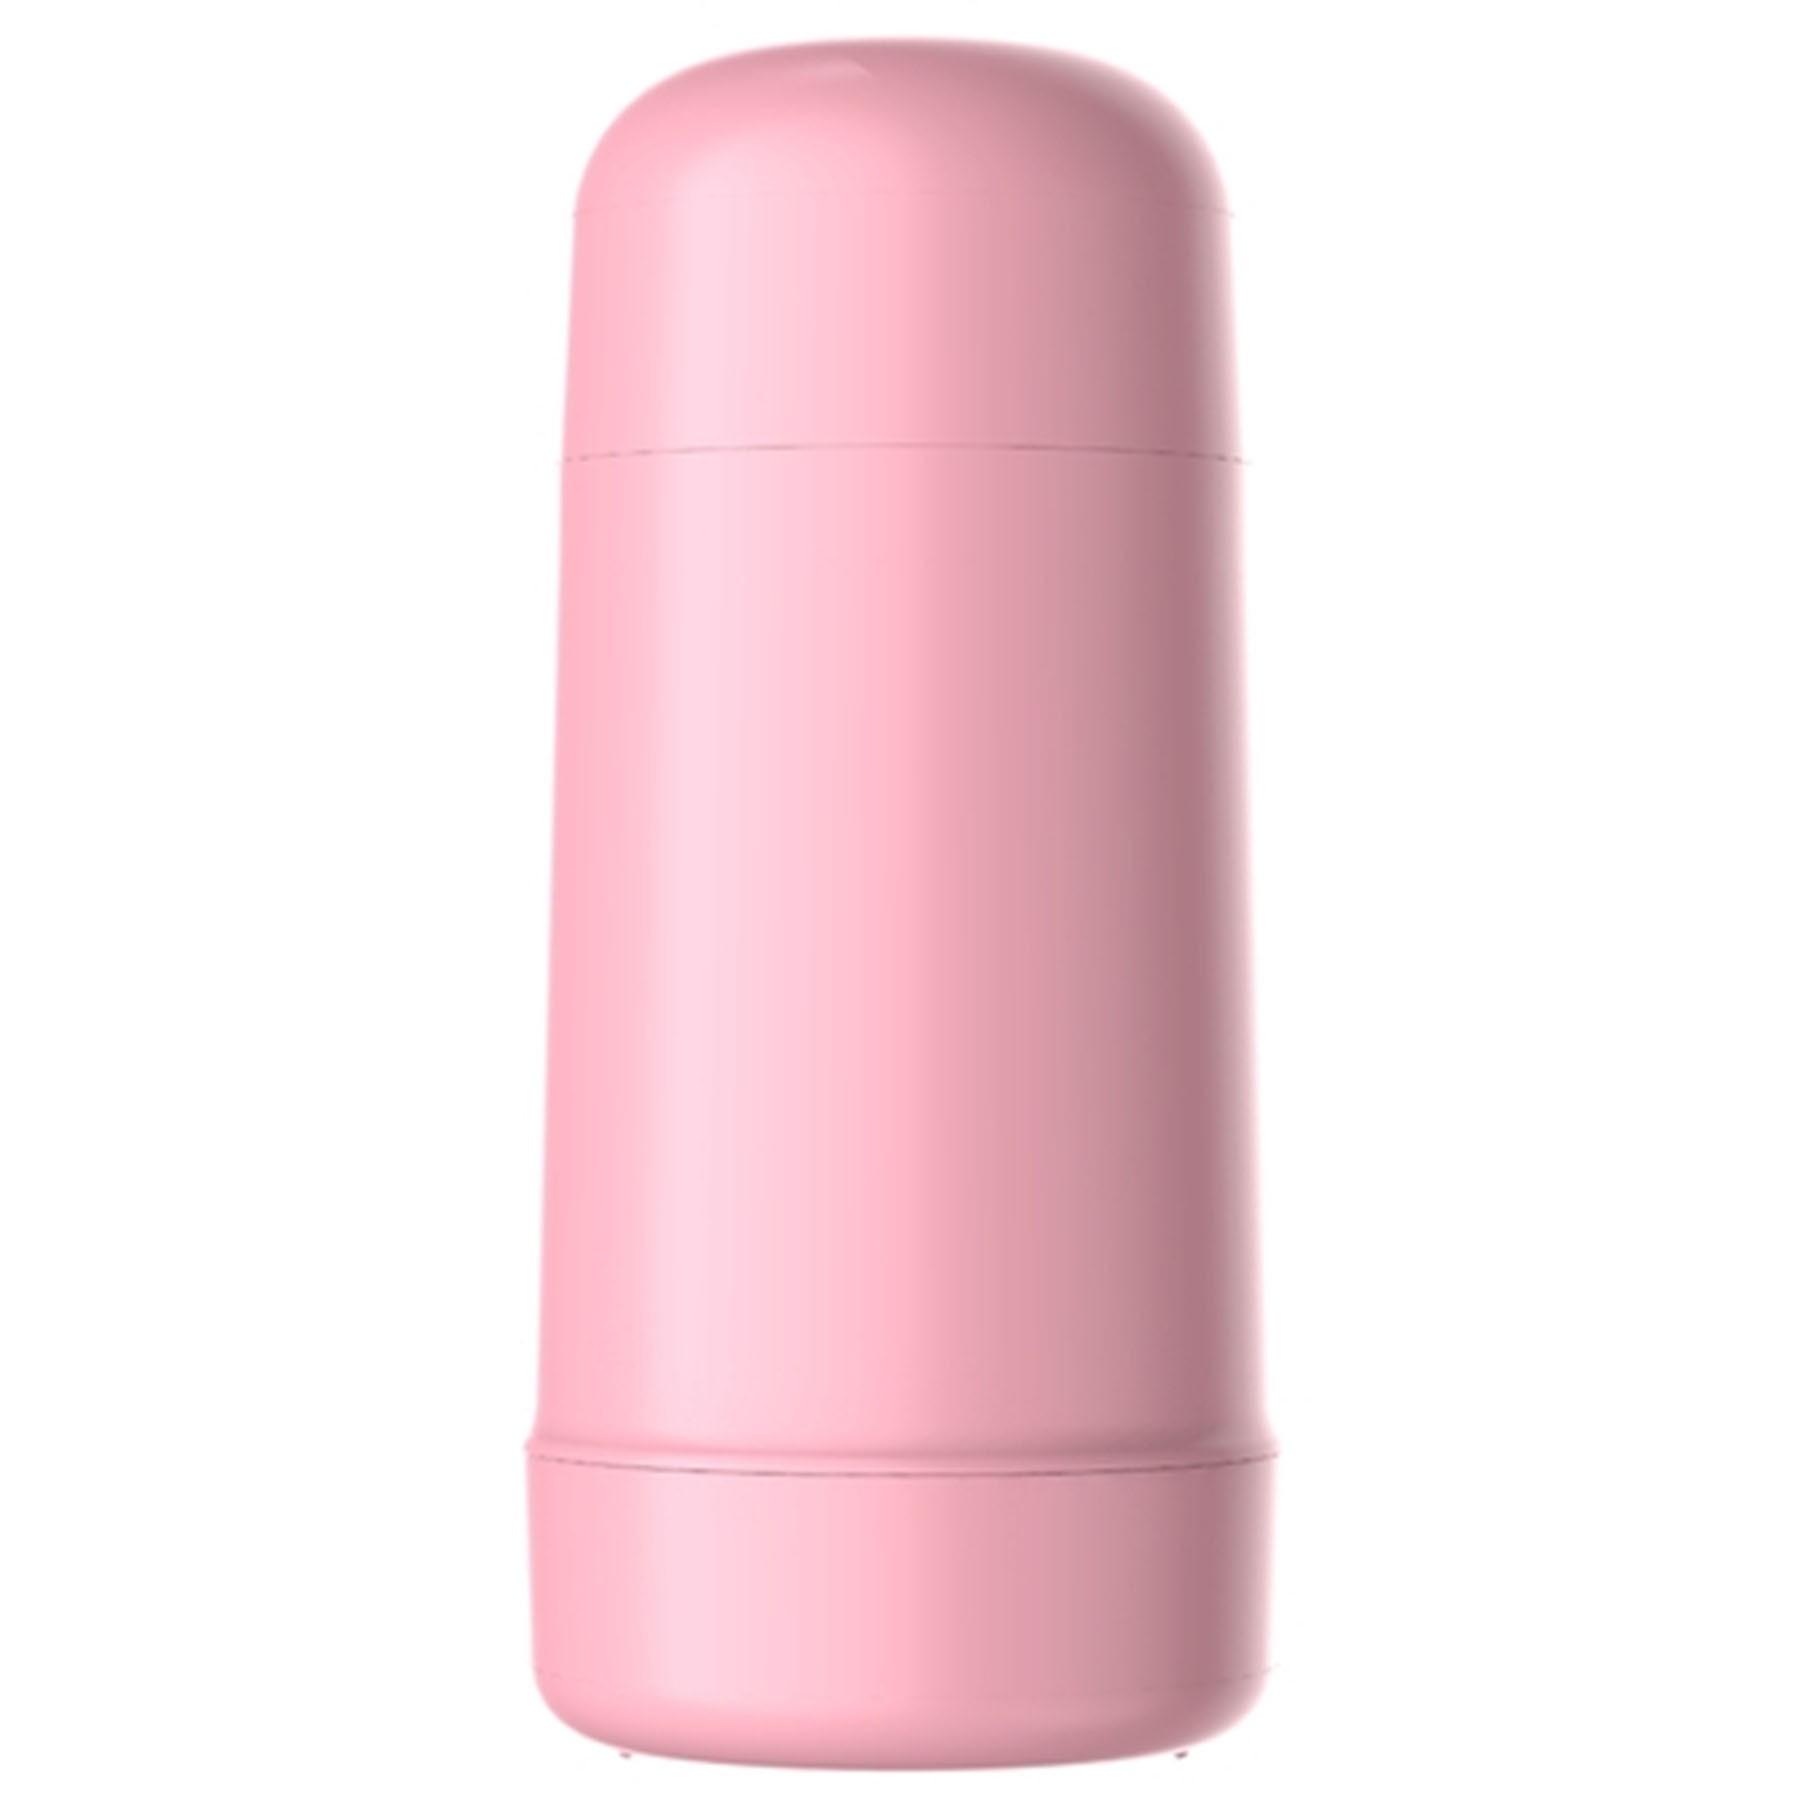 Garrafa Térmica Minig. Rosa 250ml (Rolha Cl)Termolar 8603RSP